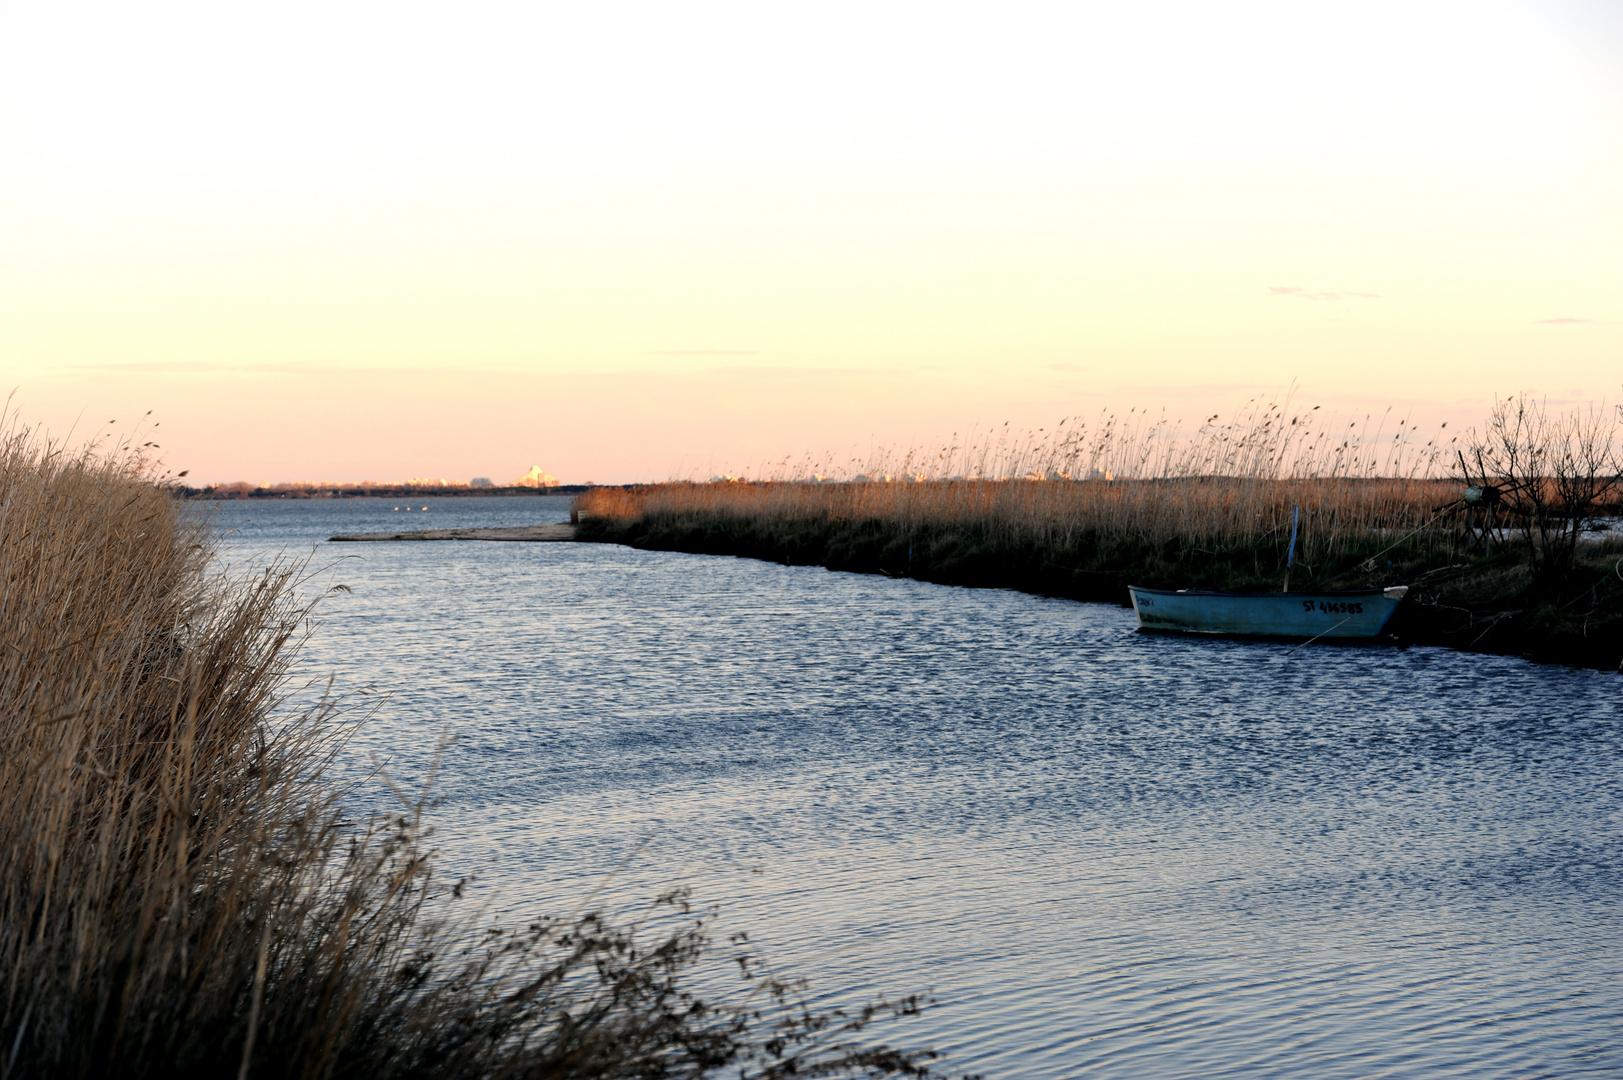 La barque sur l'étang